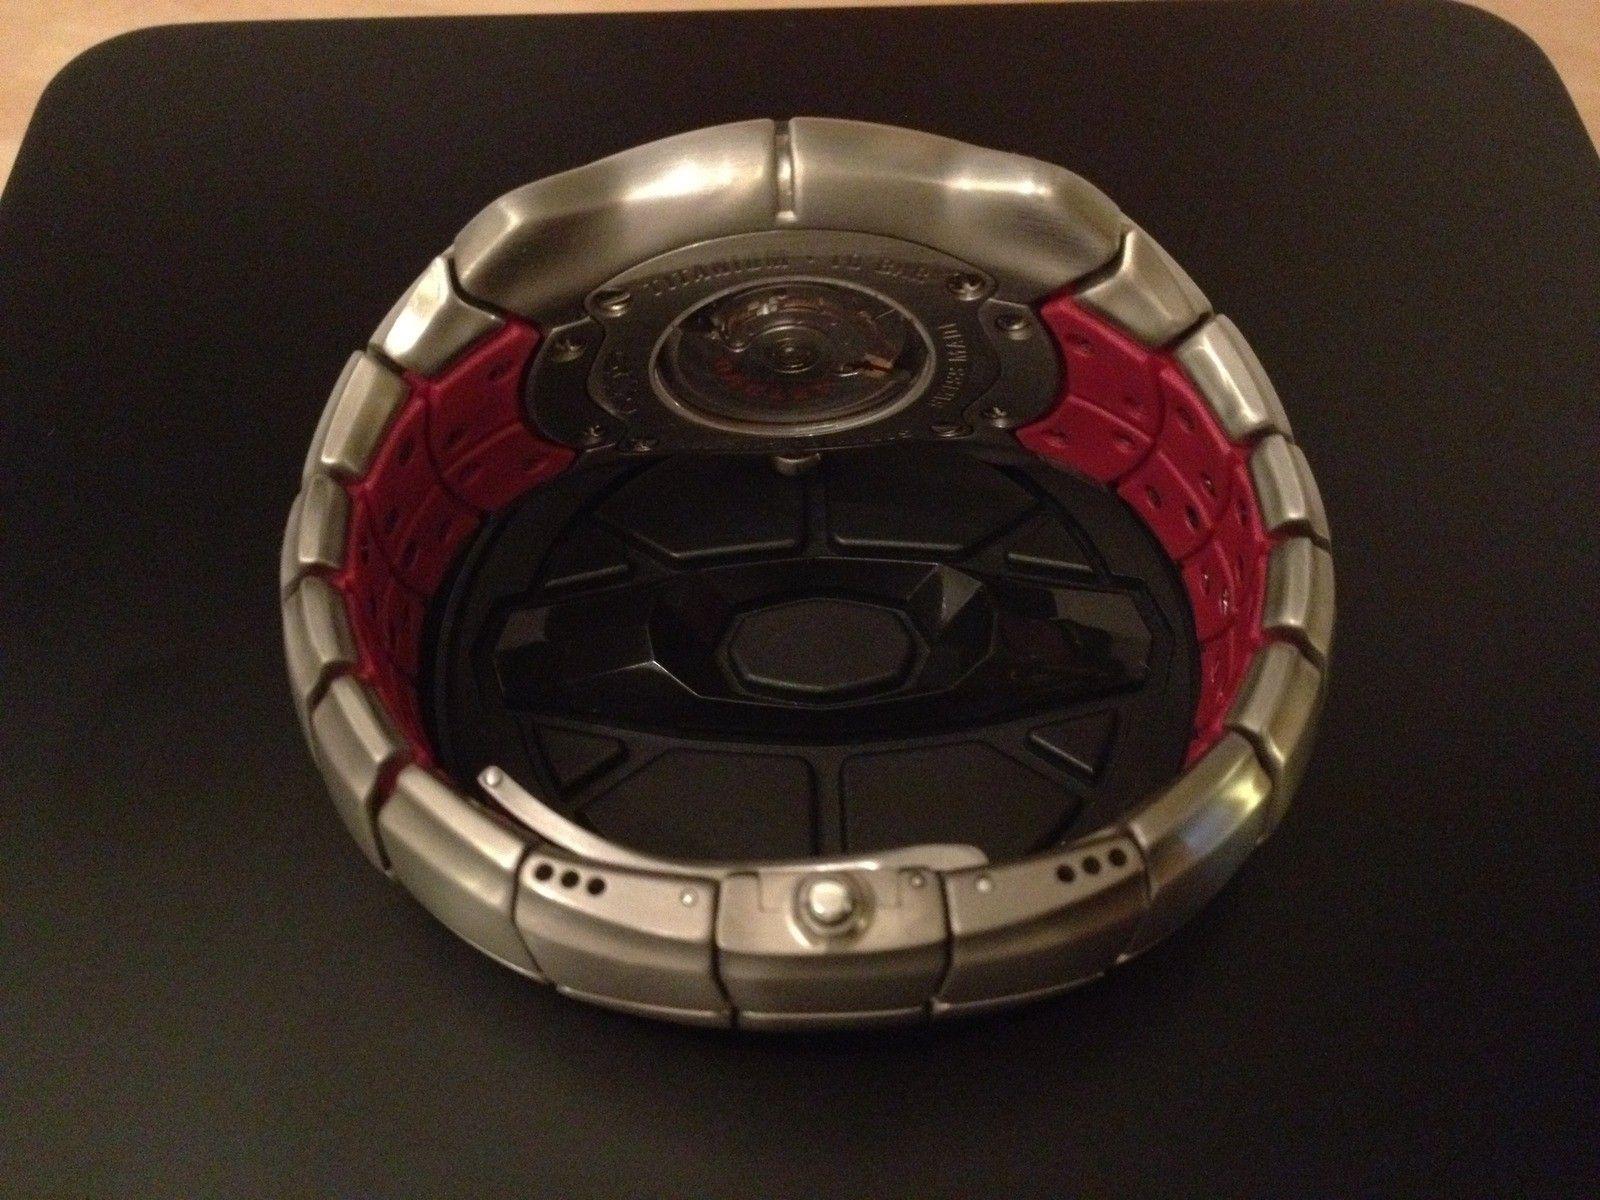 Time Bomb II - oakleytbii2.jpg